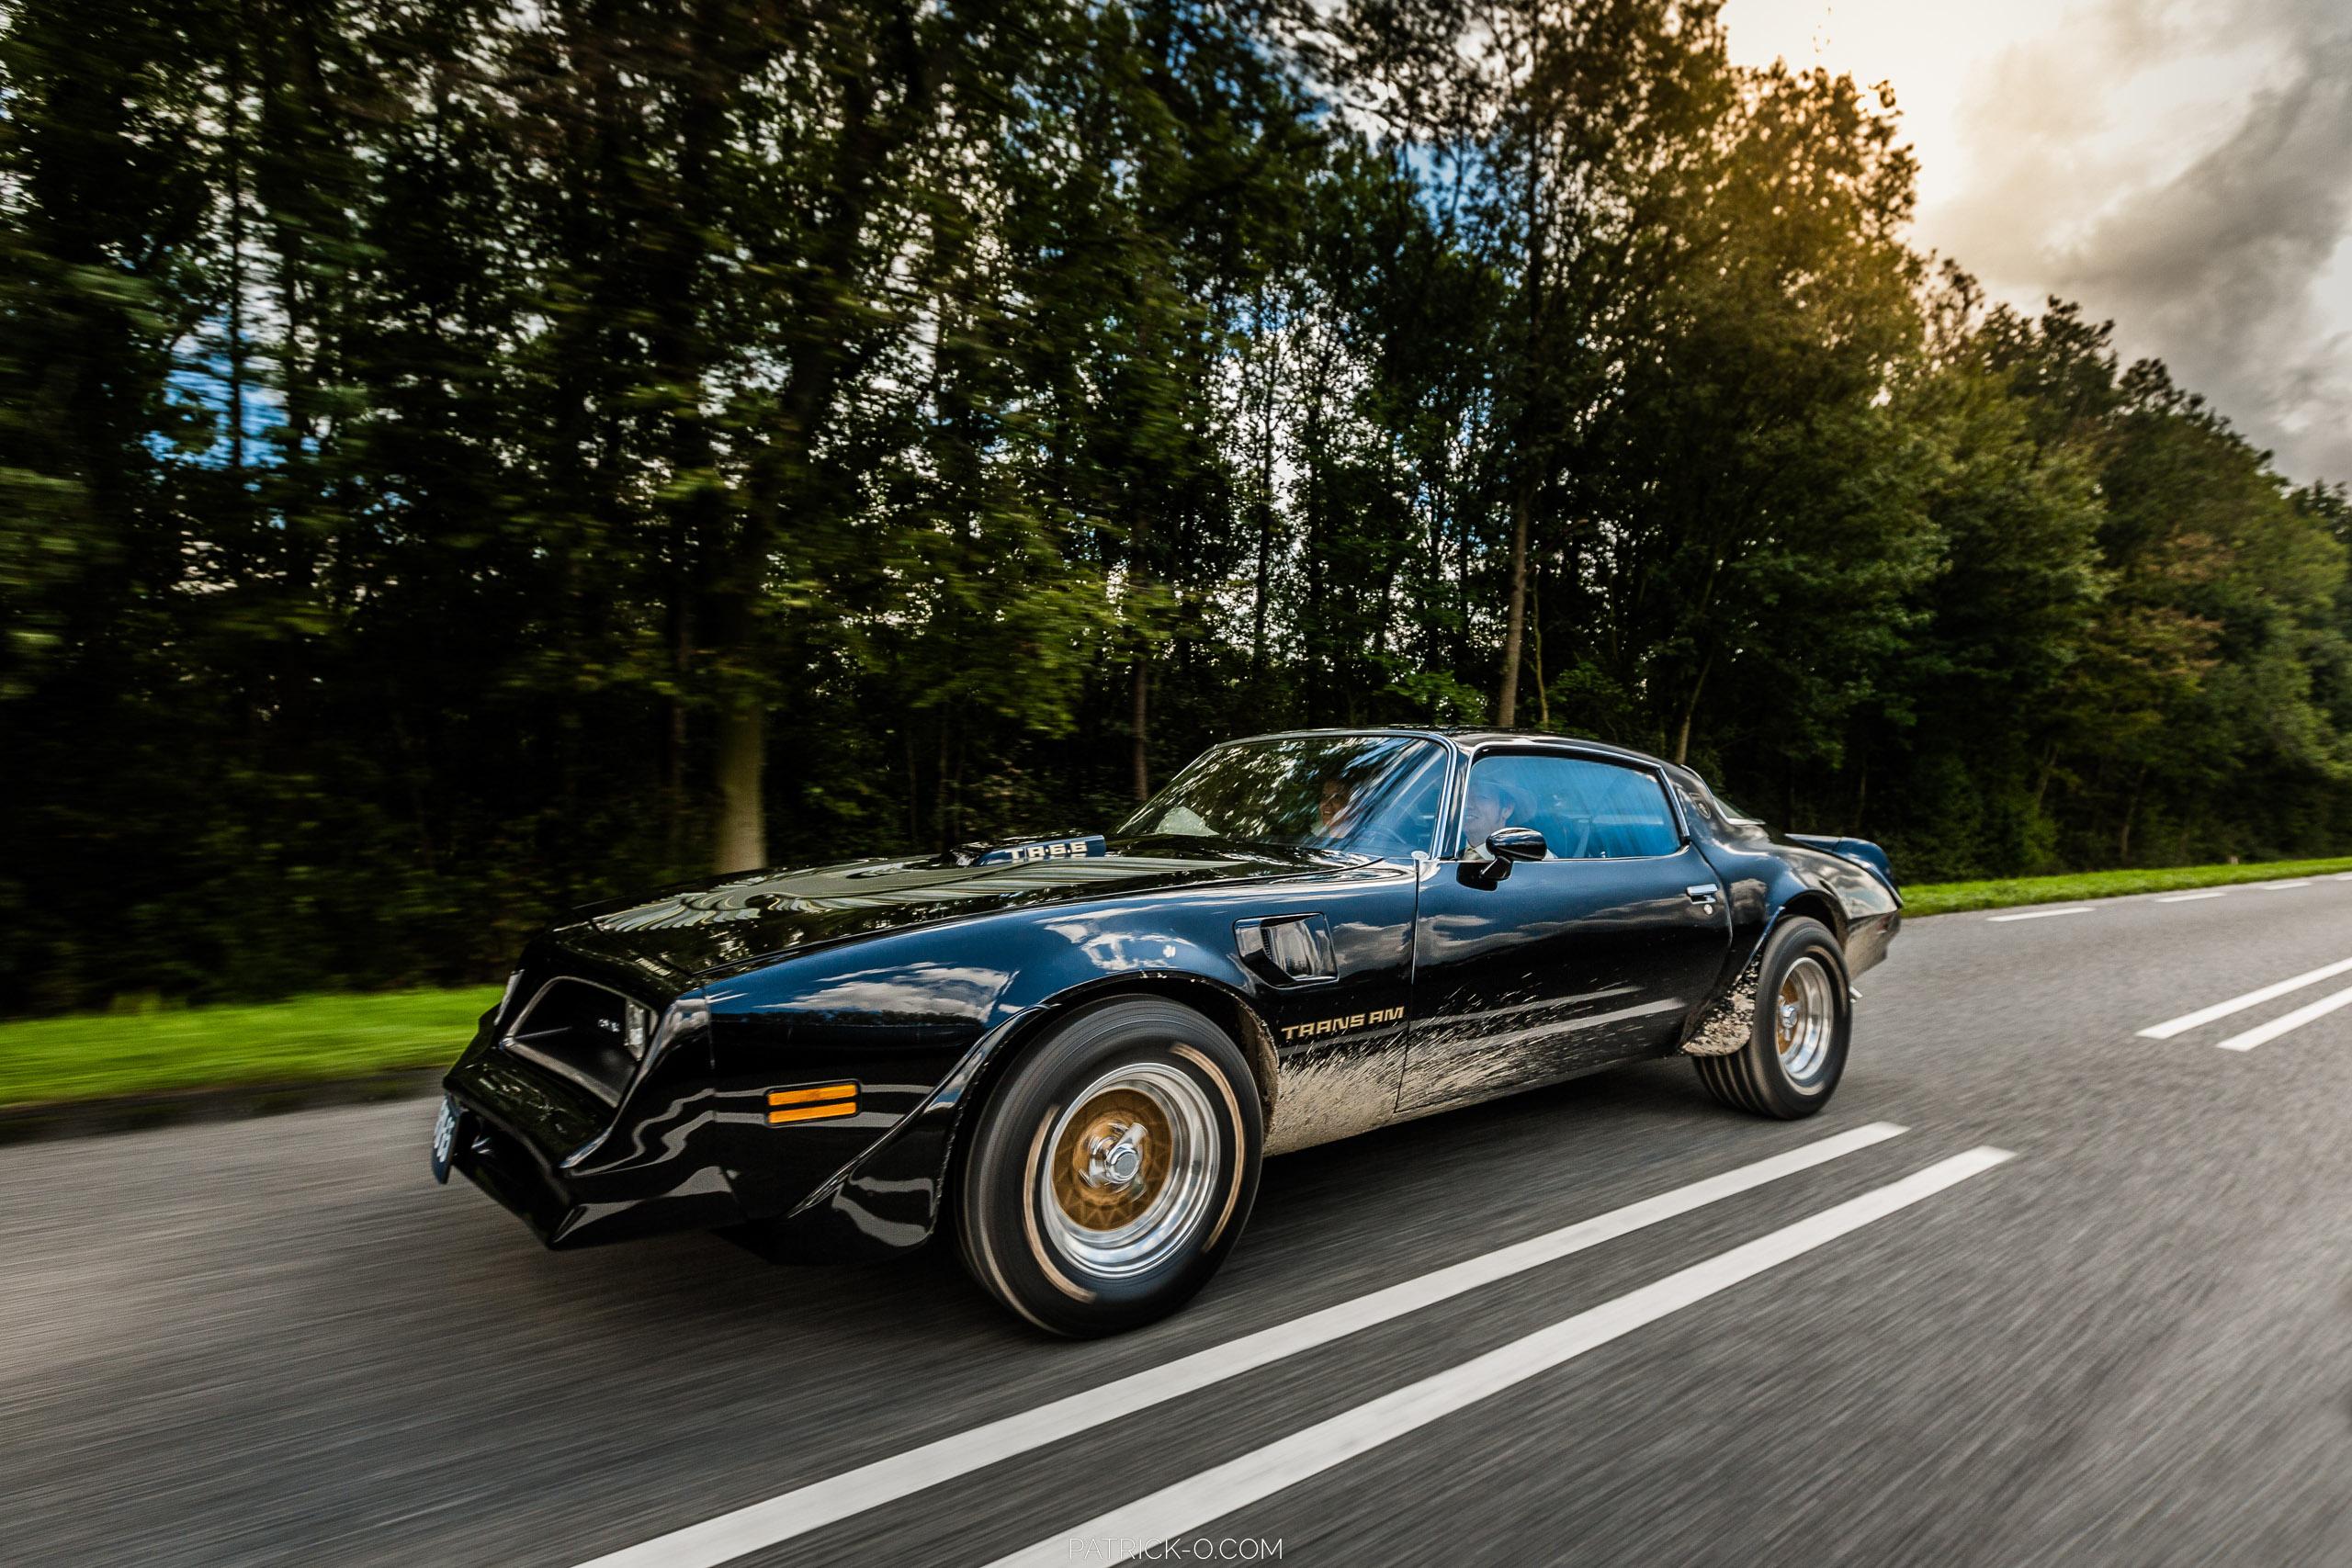 Trouwauto Pontiac Trans Am